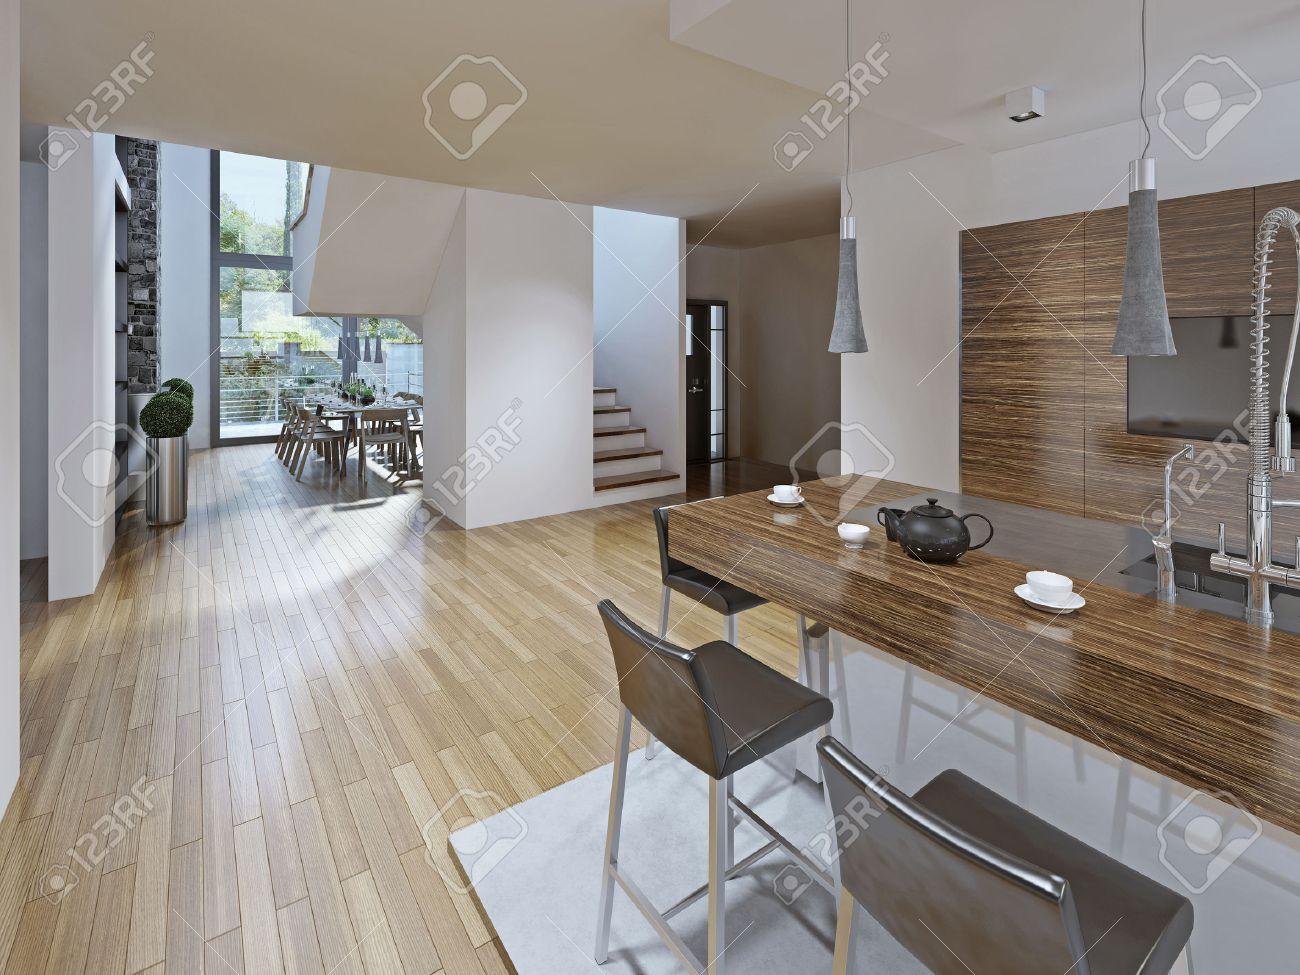 Stunning Cucina Sala Pranzo Ideas - Design & Ideas 2017 - candp.us